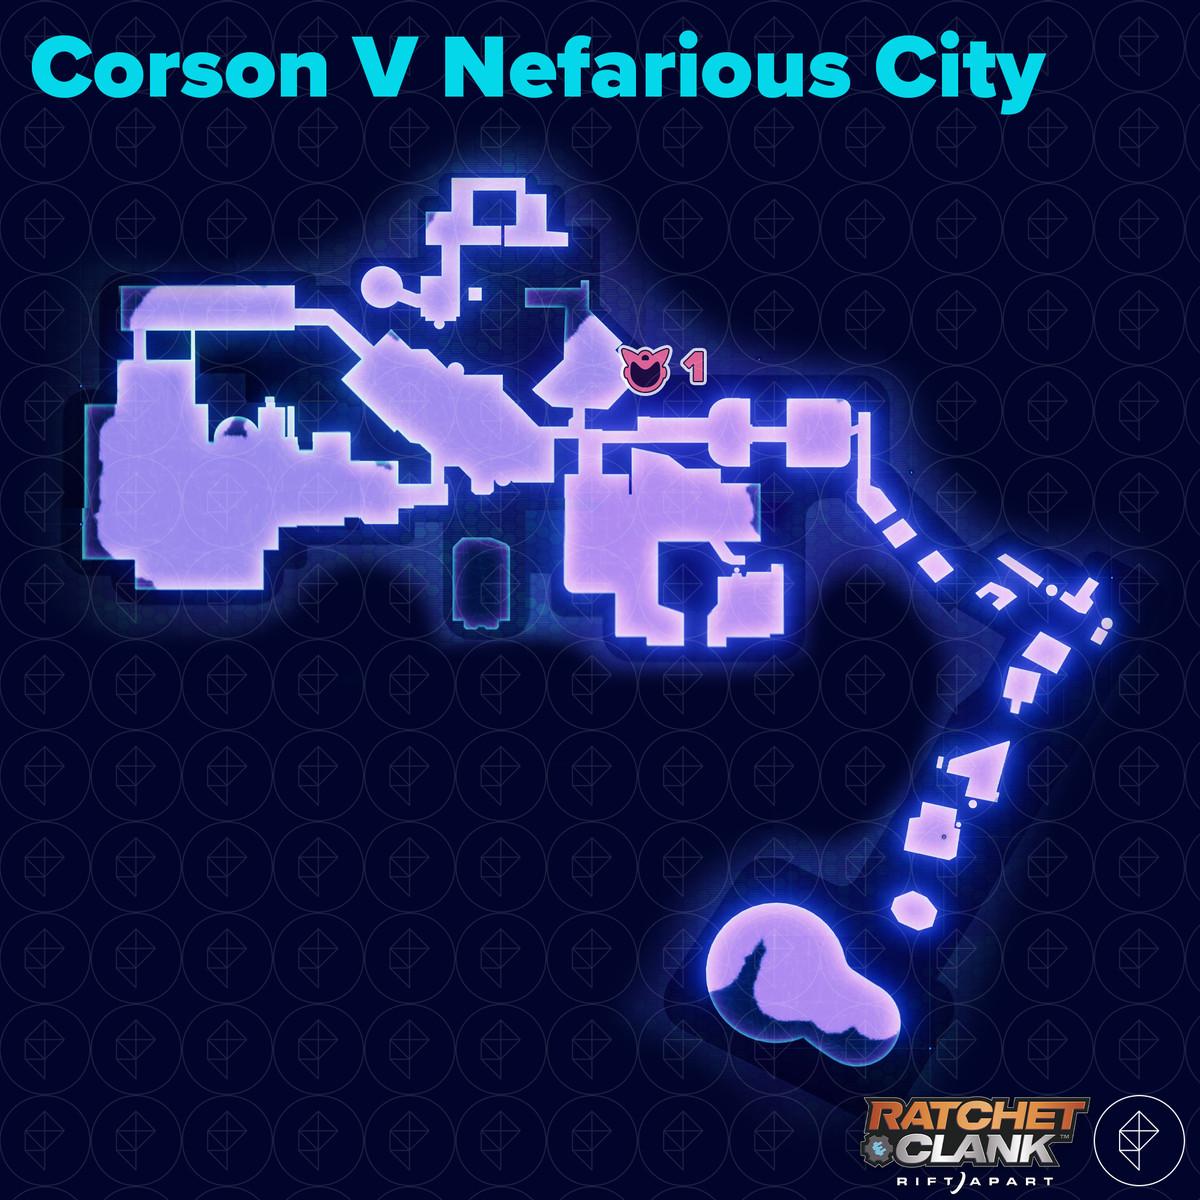 Ratchet & Clank: Rift Apart collectibles guide: Corson V Nefarious City